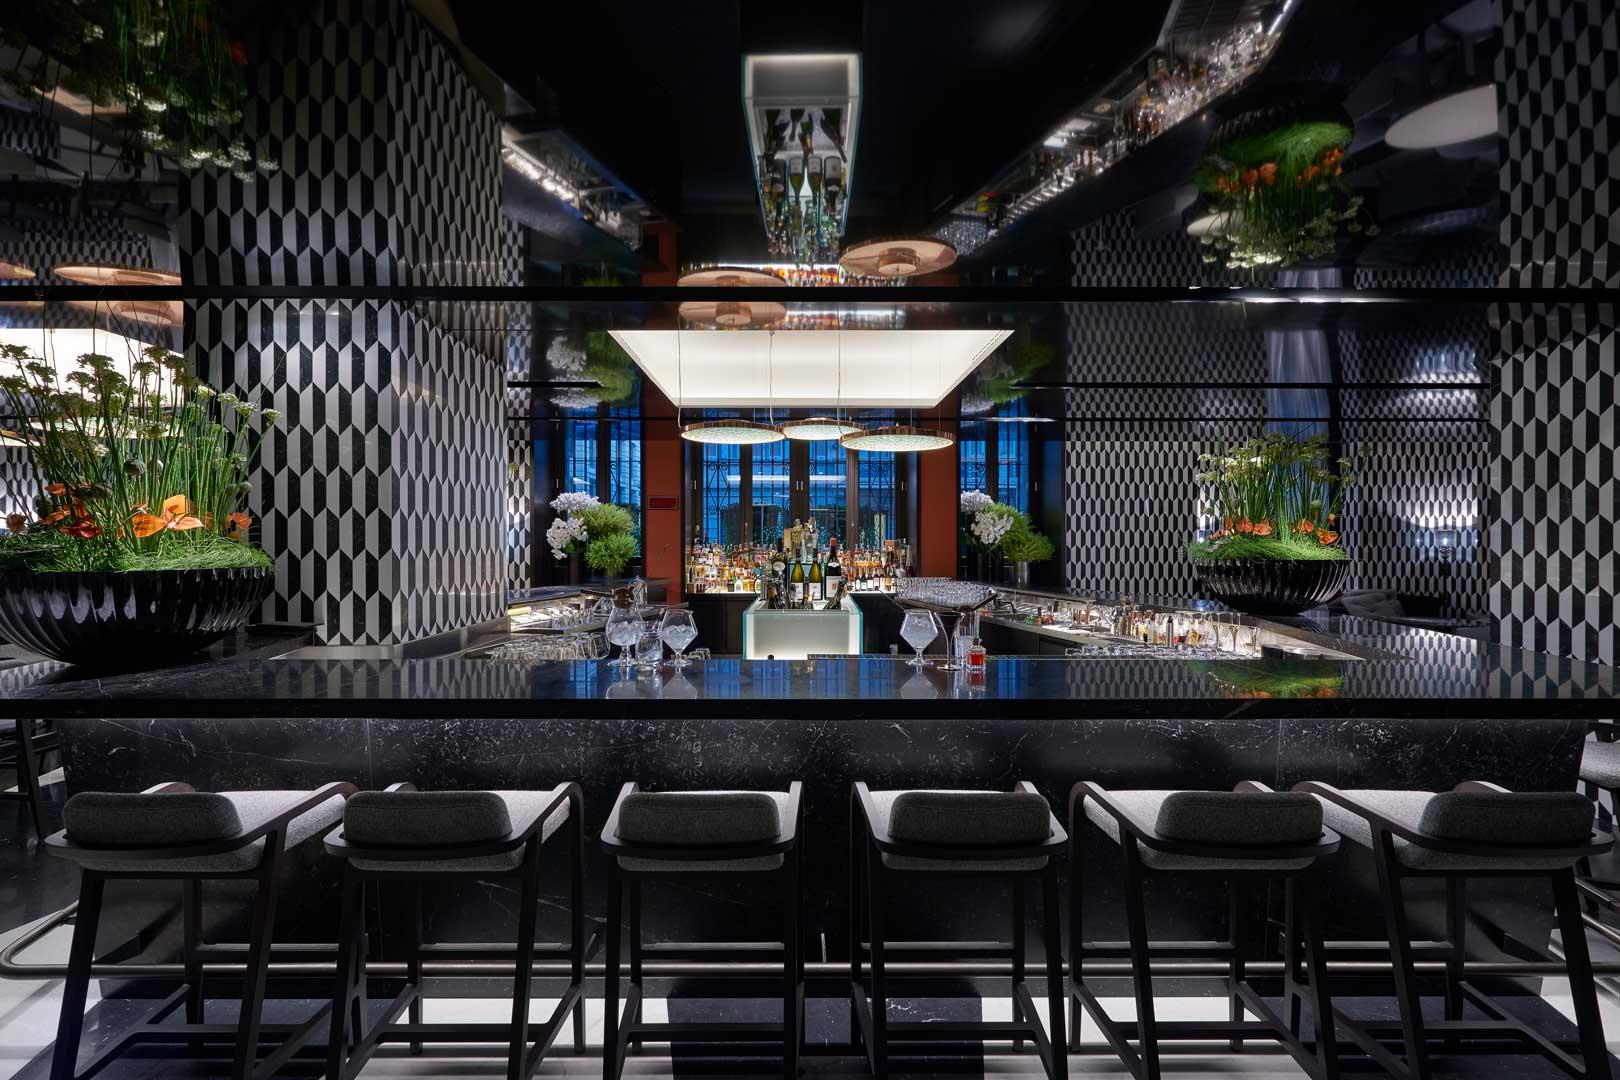 I 10 migliori cocktail bar d'Italia - Mandarin Oriental Milan